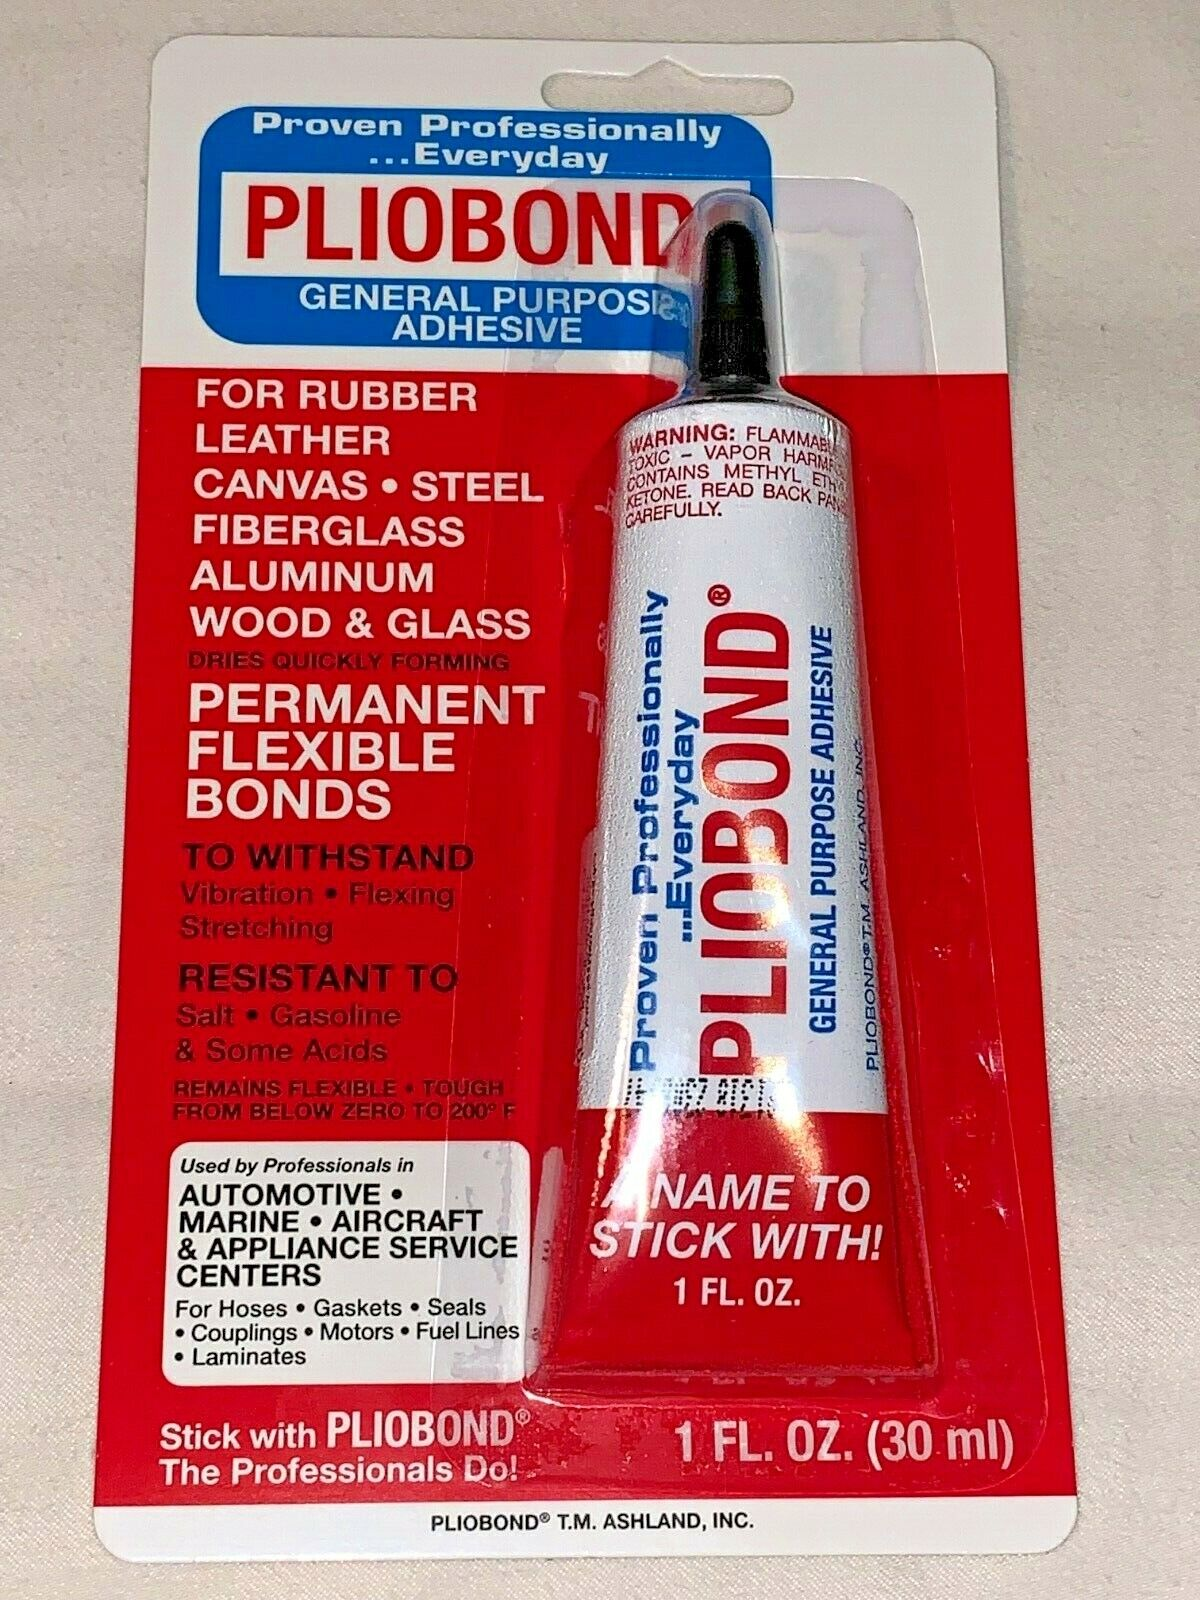 Pliobond Adhesive Rubber Leather Steel Fiberglass Aluminum Wood glass Tube 1 Oz Adhesives & Tape